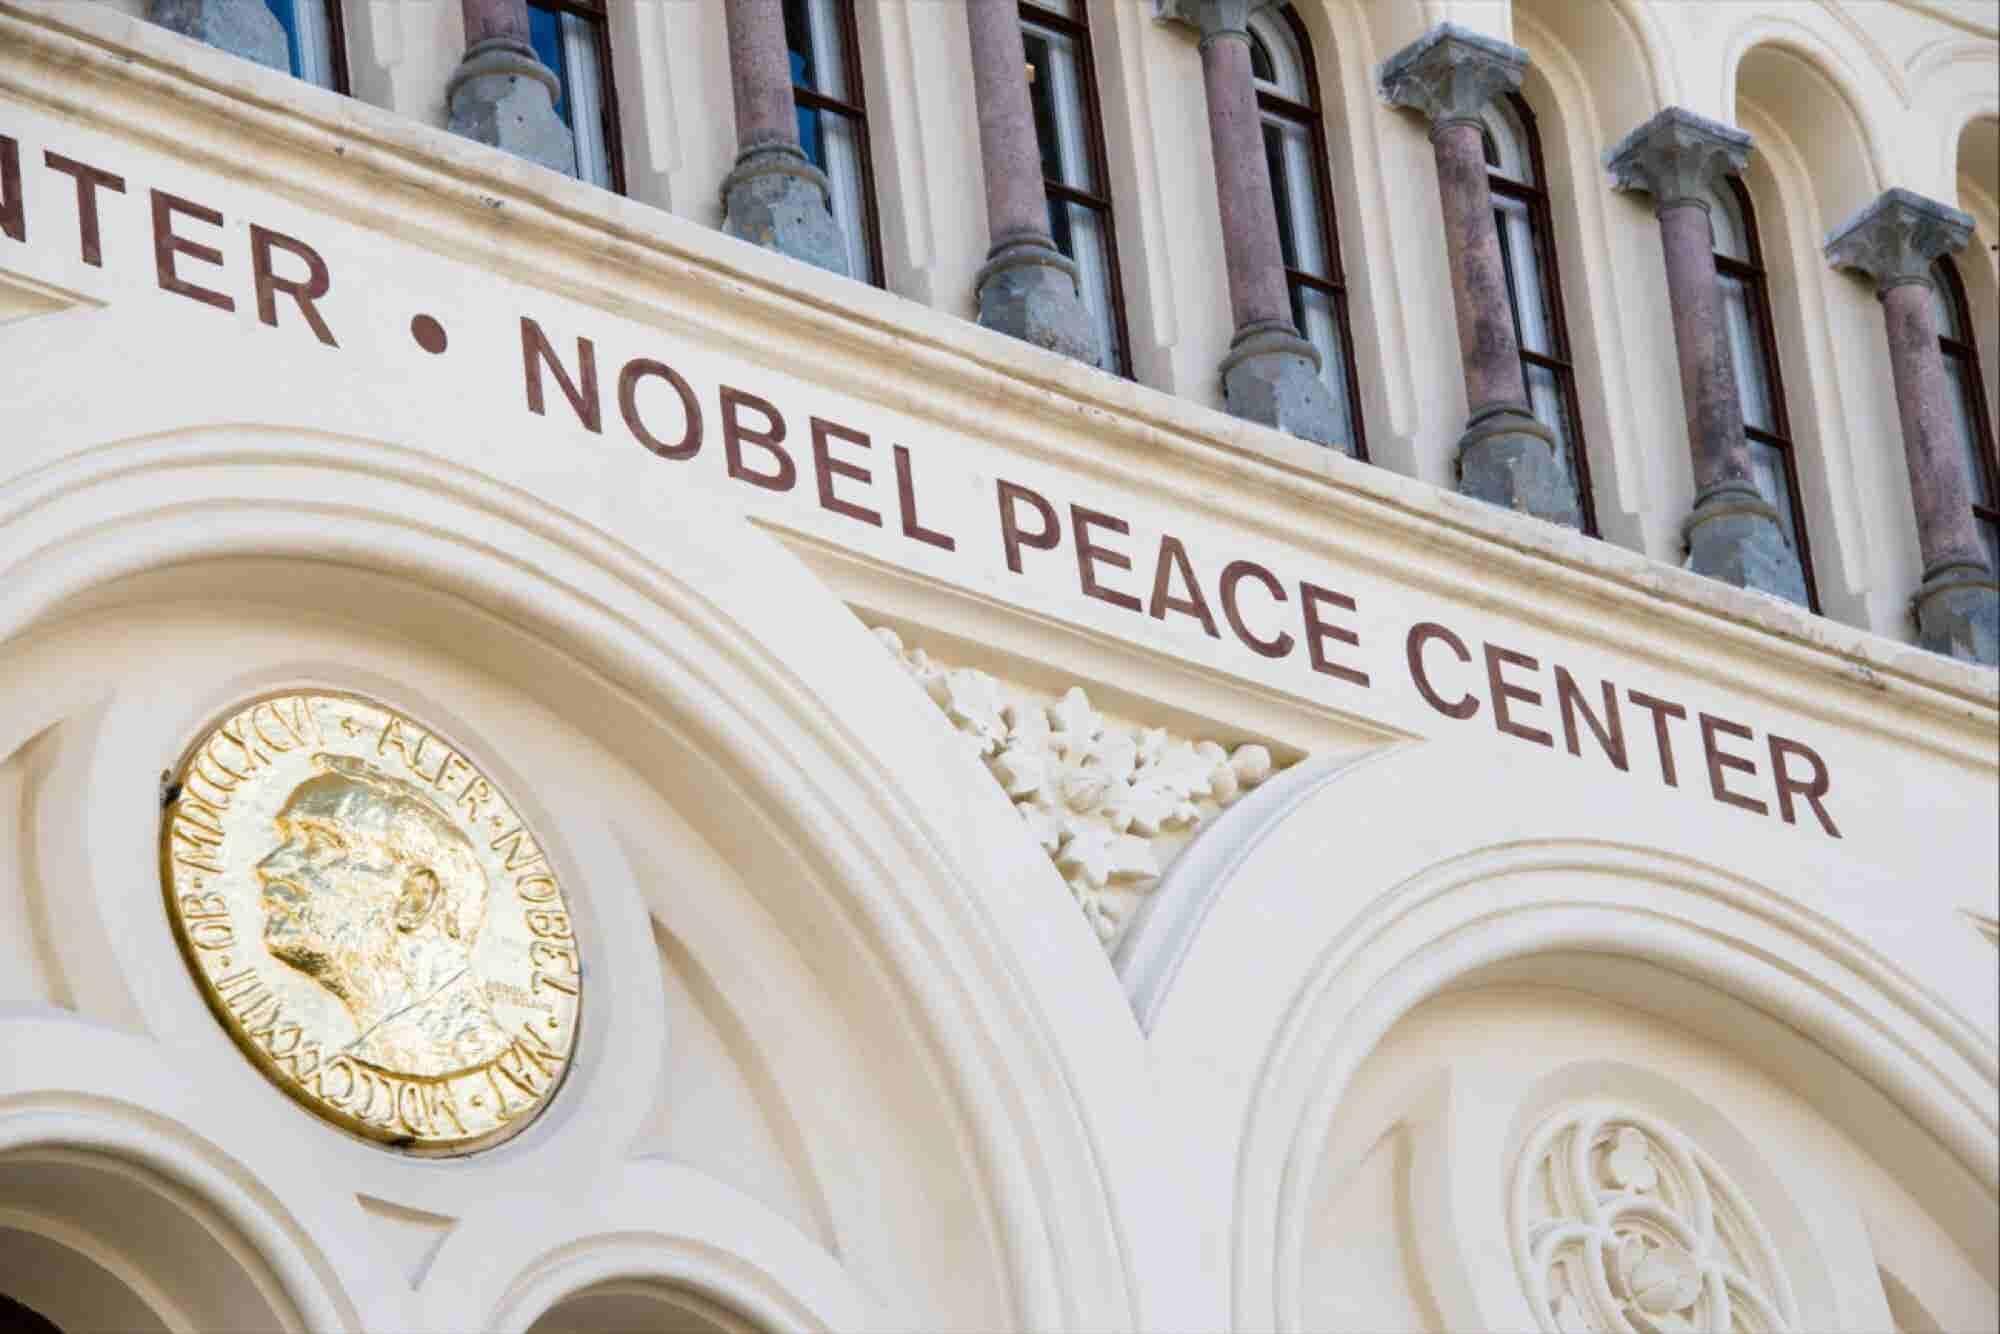 Tunisia National Dialogue Quartet Awarded 2015 Nobel Peace Prize